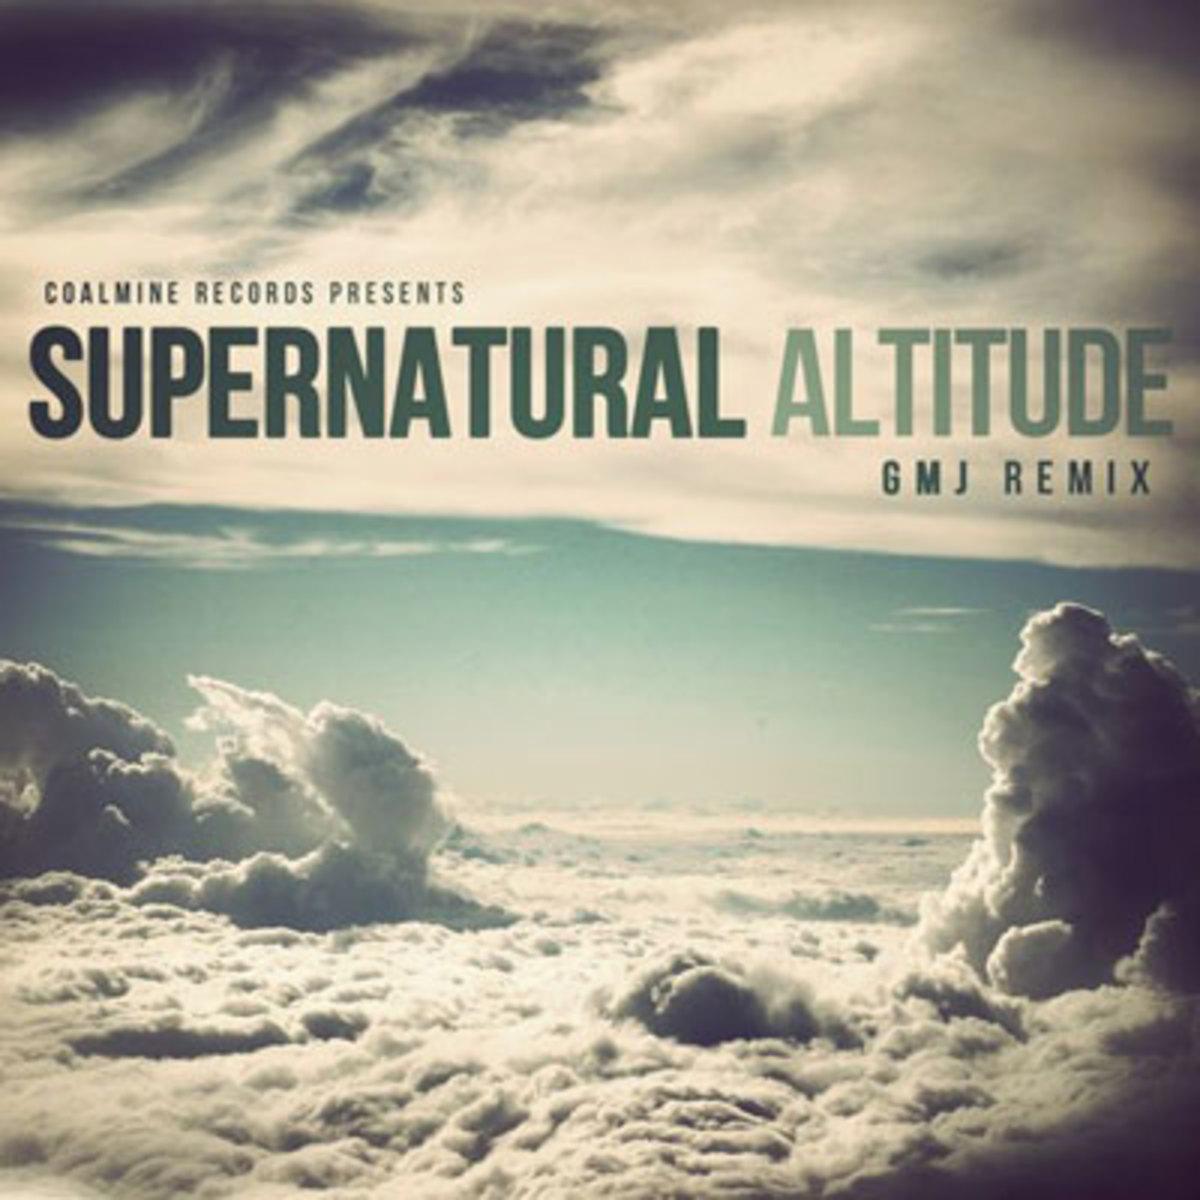 supernatural-altitudermx.jpg